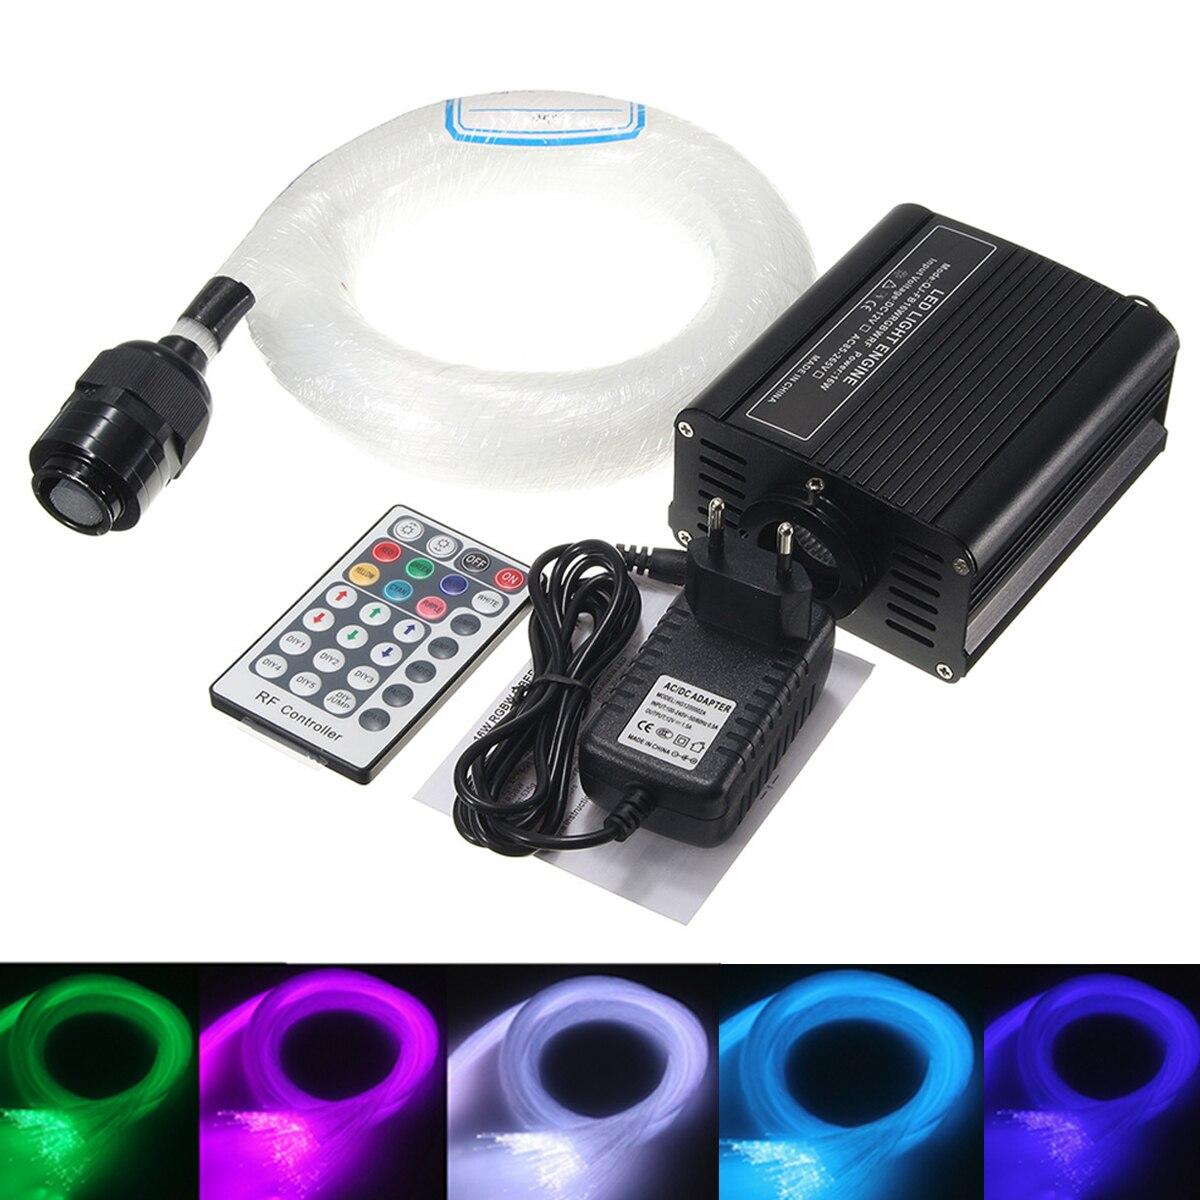 все цены на 300Pcs Fiber Optic Lamp 16W Fiber Optic Light Source Remote Fiber Optic Lighting Machine Kit DIY Romantic Light Decoration онлайн